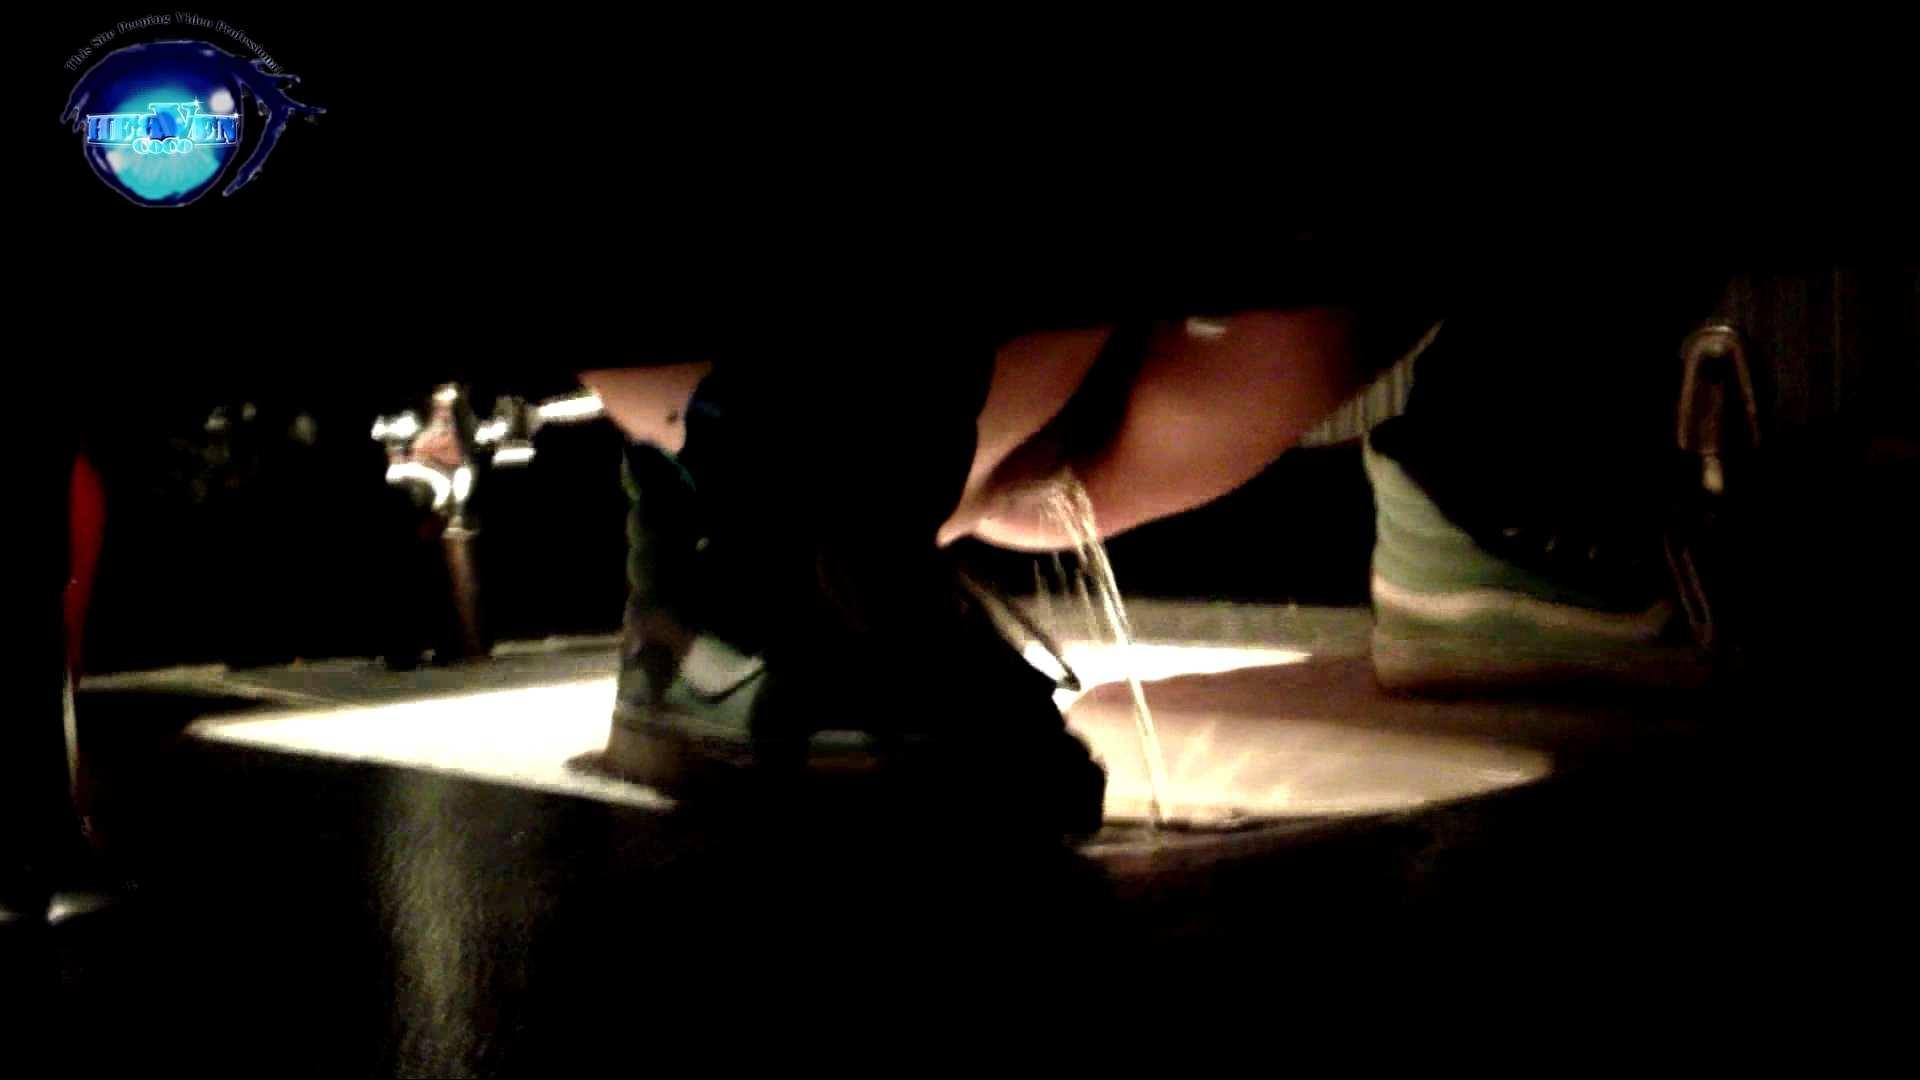 GOD HAND ファッションショッピングセンター盗撮vol.06 高画質 ワレメ動画紹介 51連発 38